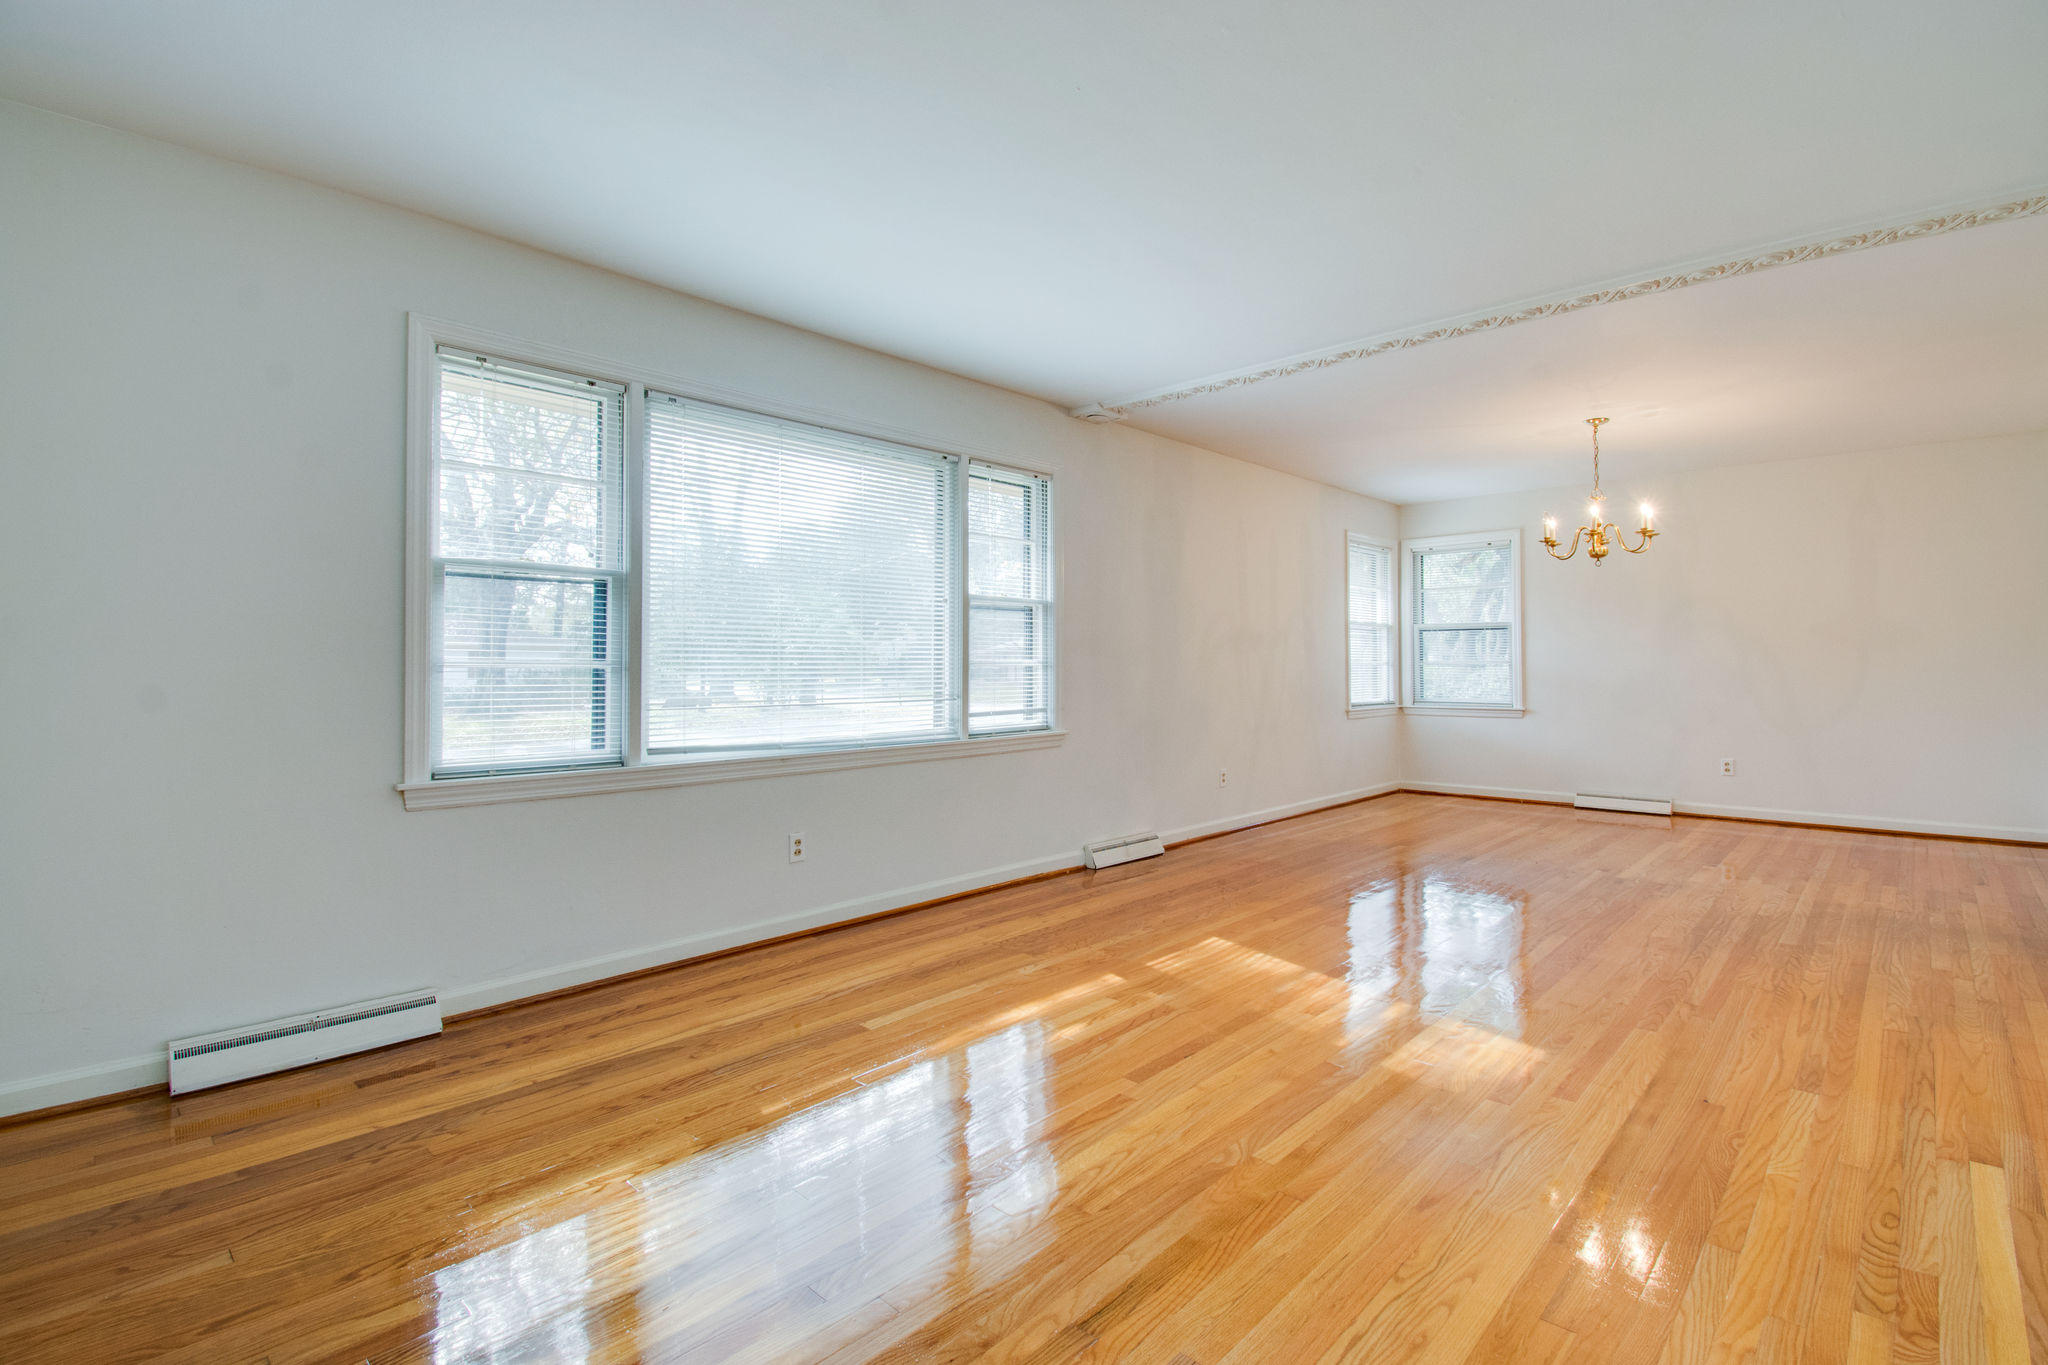 Northbridge Terrace Homes For Sale - 1114 Northbridge, Charleston, SC - 7